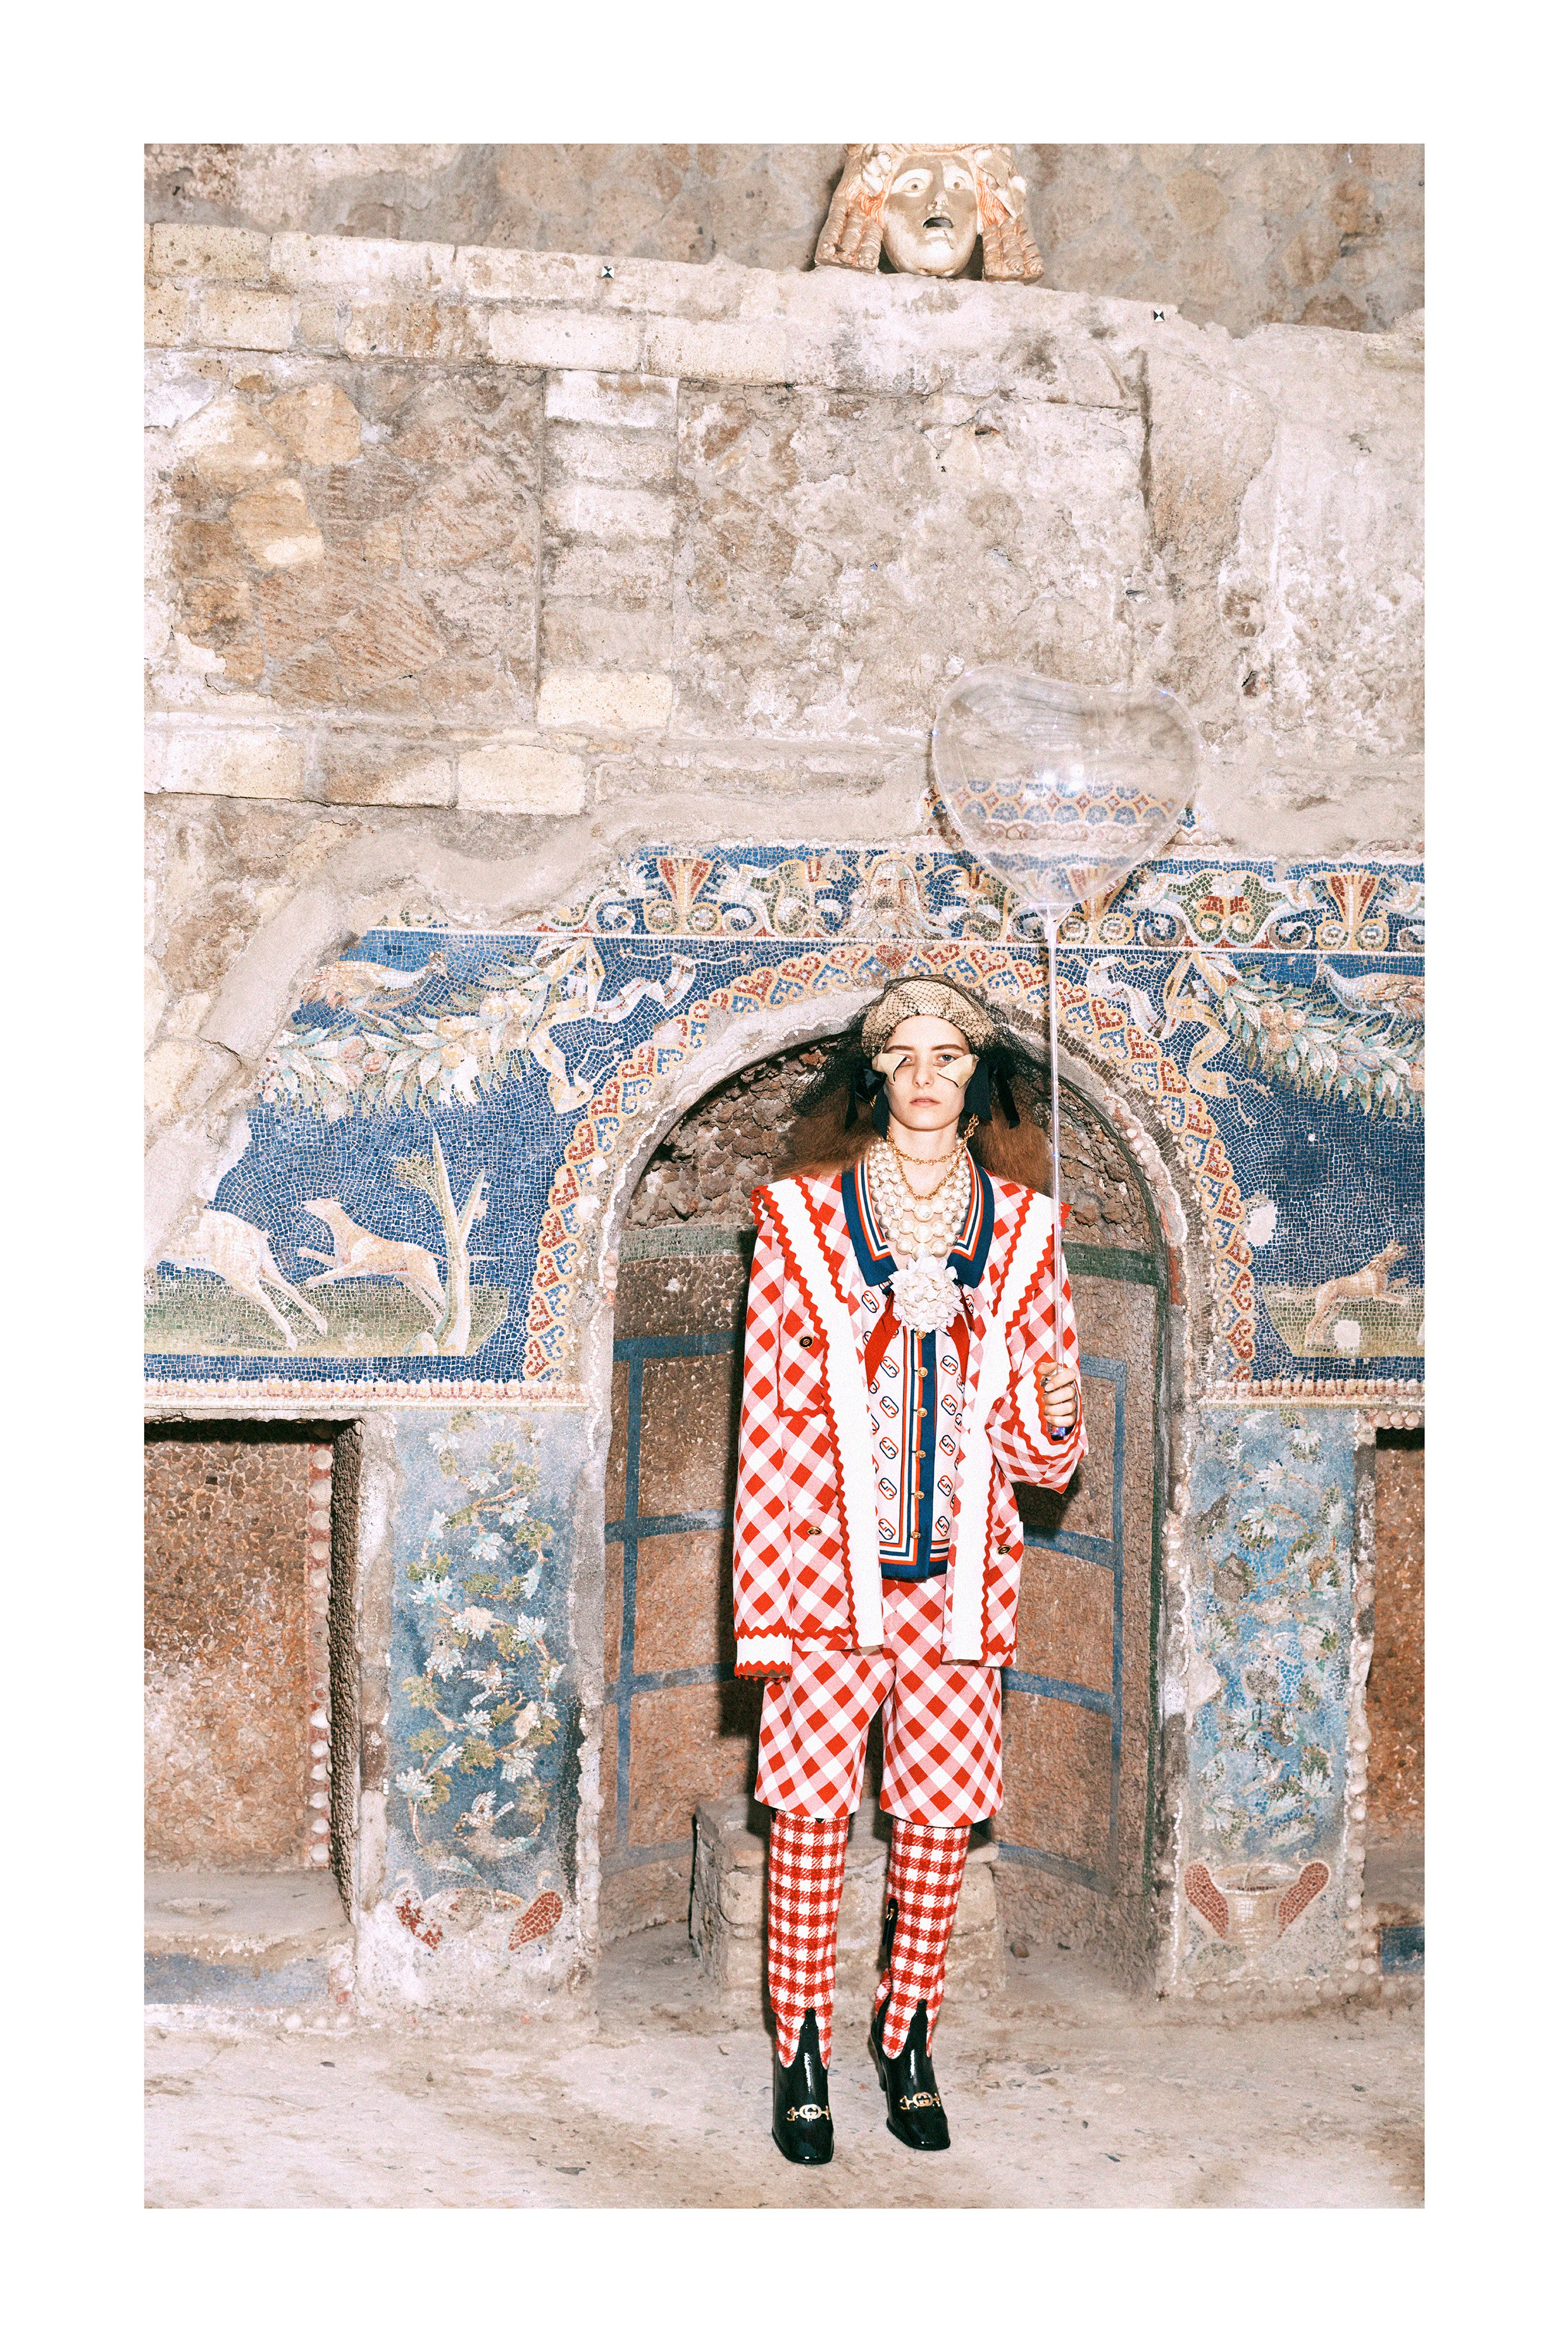 GUCCI - Pre-fall 2019  Photographer: Harmony Korine Model: Zumi Rosow, Achok Majak, Amelleah Thomas, Delphi Mcnicol, Elia Sophia, Iraida Grit, Mea Lapres, Dwight Hoogendijk, Emmanuel Adjaye, Matiss Rucko, Paul-Hendrick Piho, Rai Langlois, Thomas Riguelle Location: Pompei &  Herculaneum, Italy